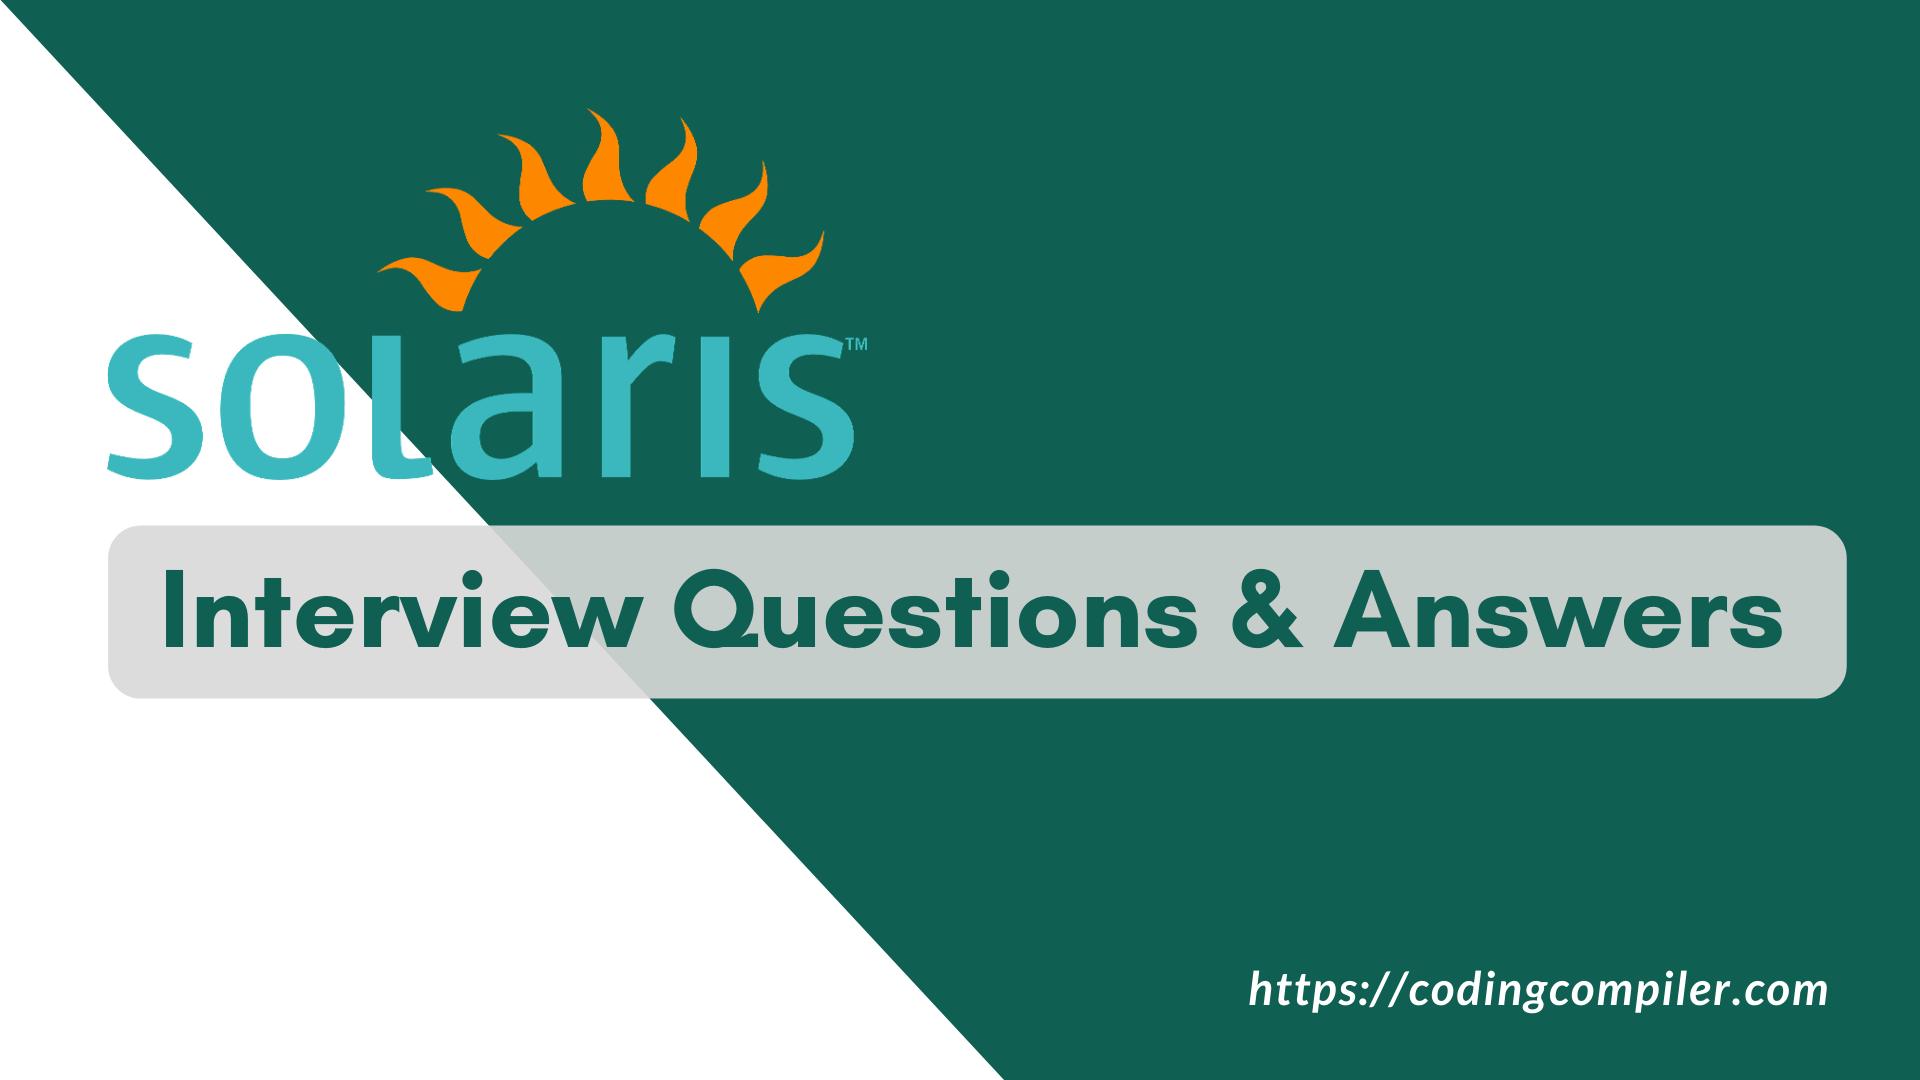 Sun Solaris Interview Questions